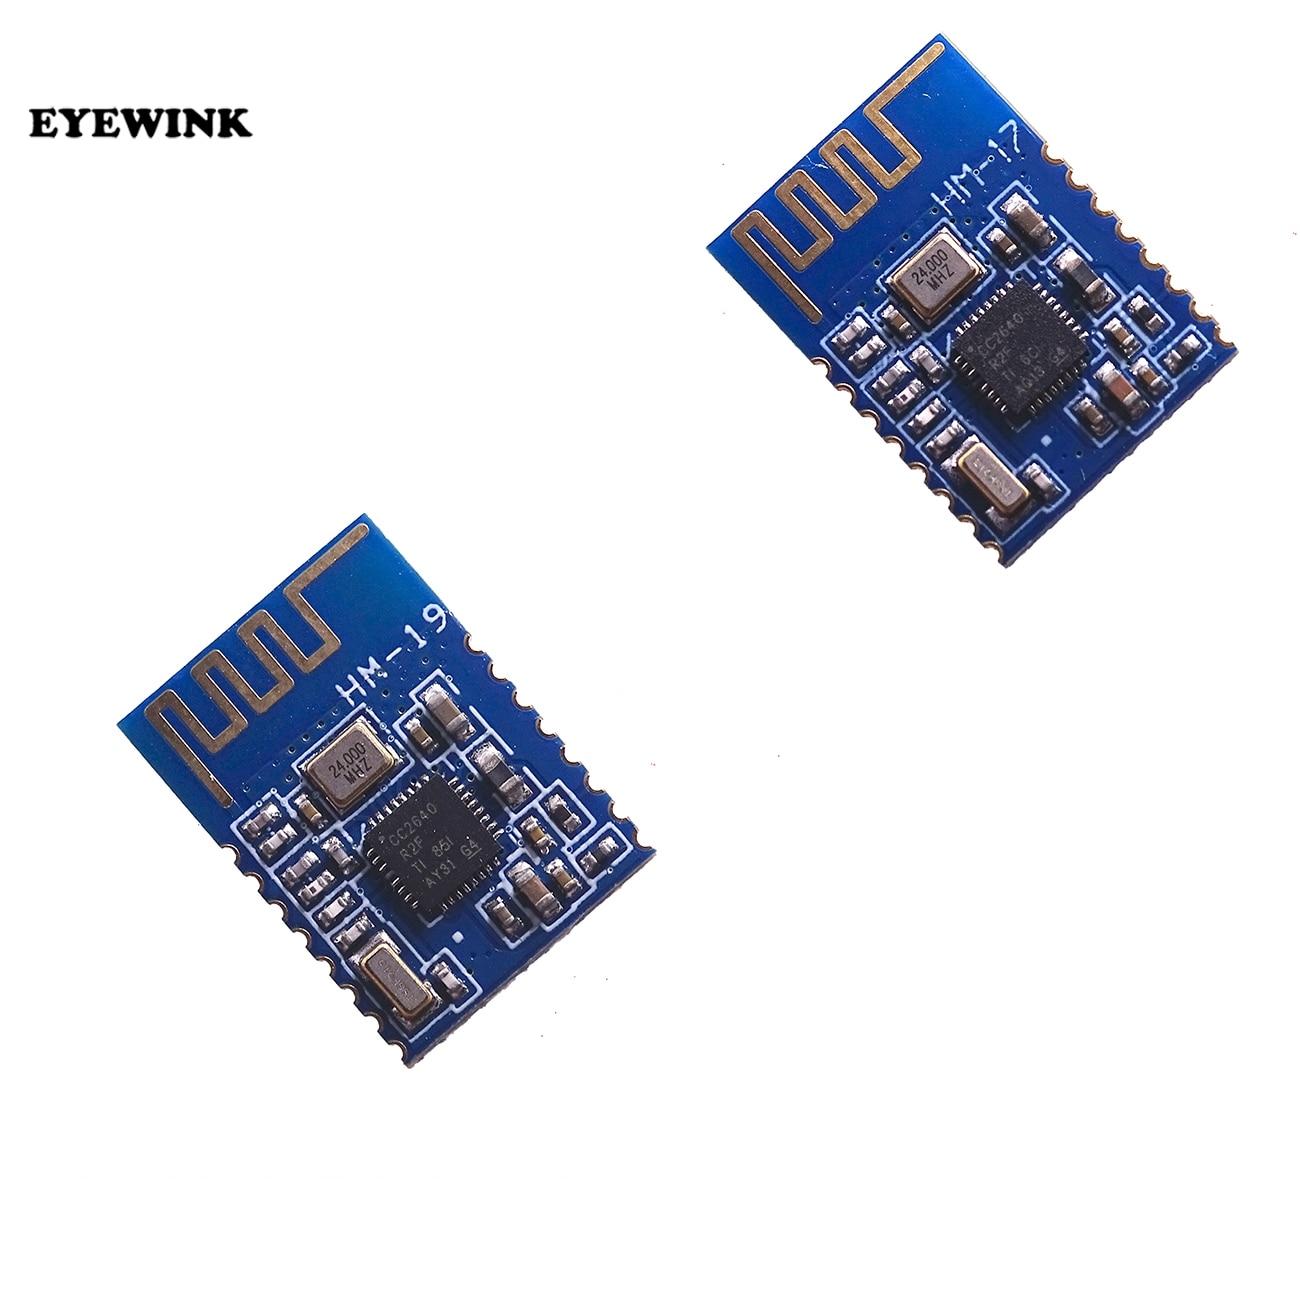 1PCS HM-17 HM-19 CC2640R2F Bluetooth module ble4.0 4.2 5.0 CC2640 Wireless Bluetooth serial port module High speed Smaller